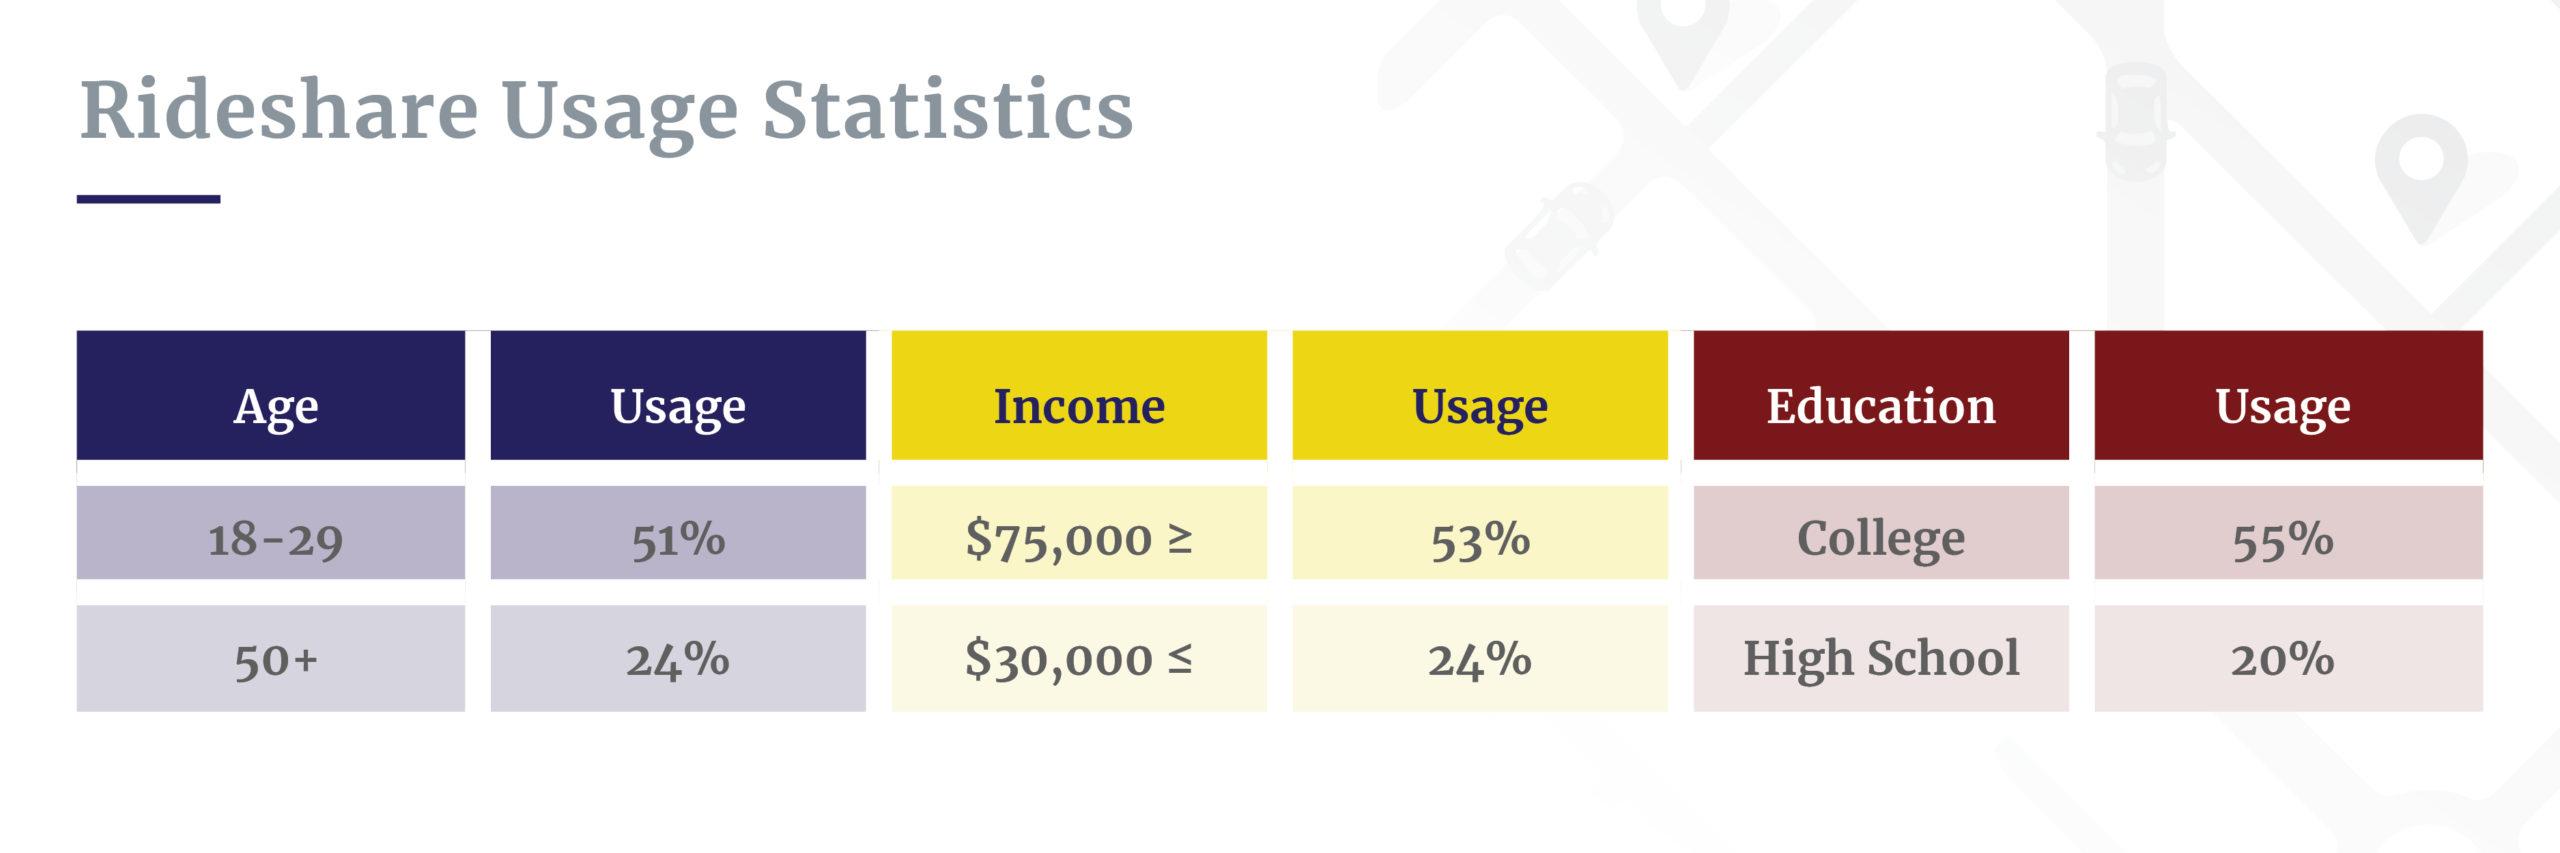 Rideshare usage statistics